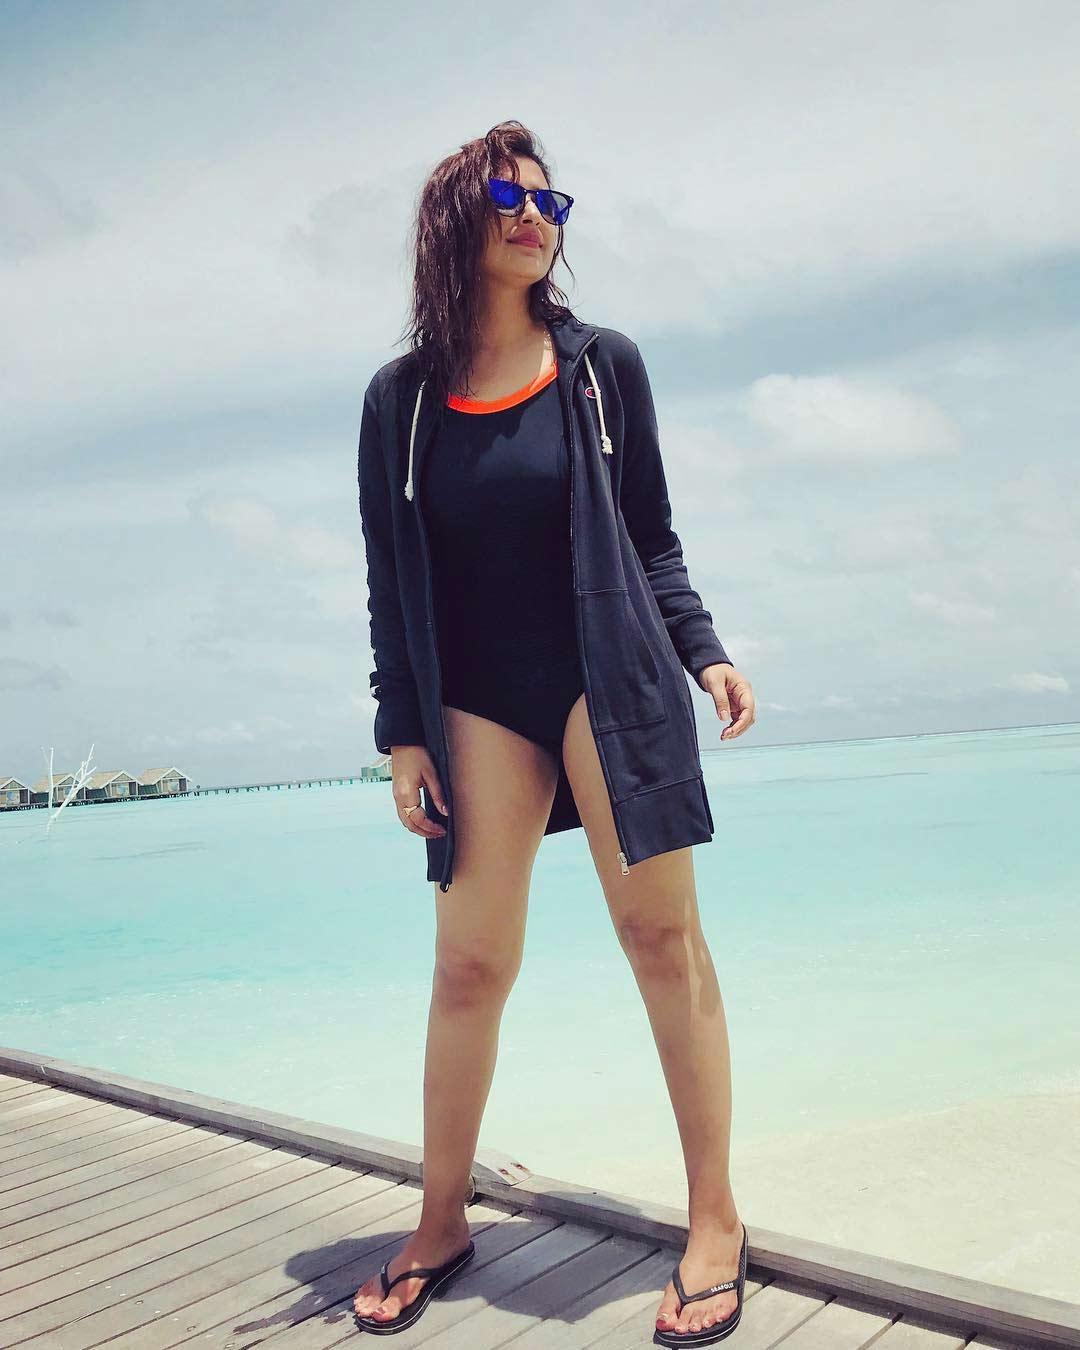 Parineeti Chopra is in Maldives